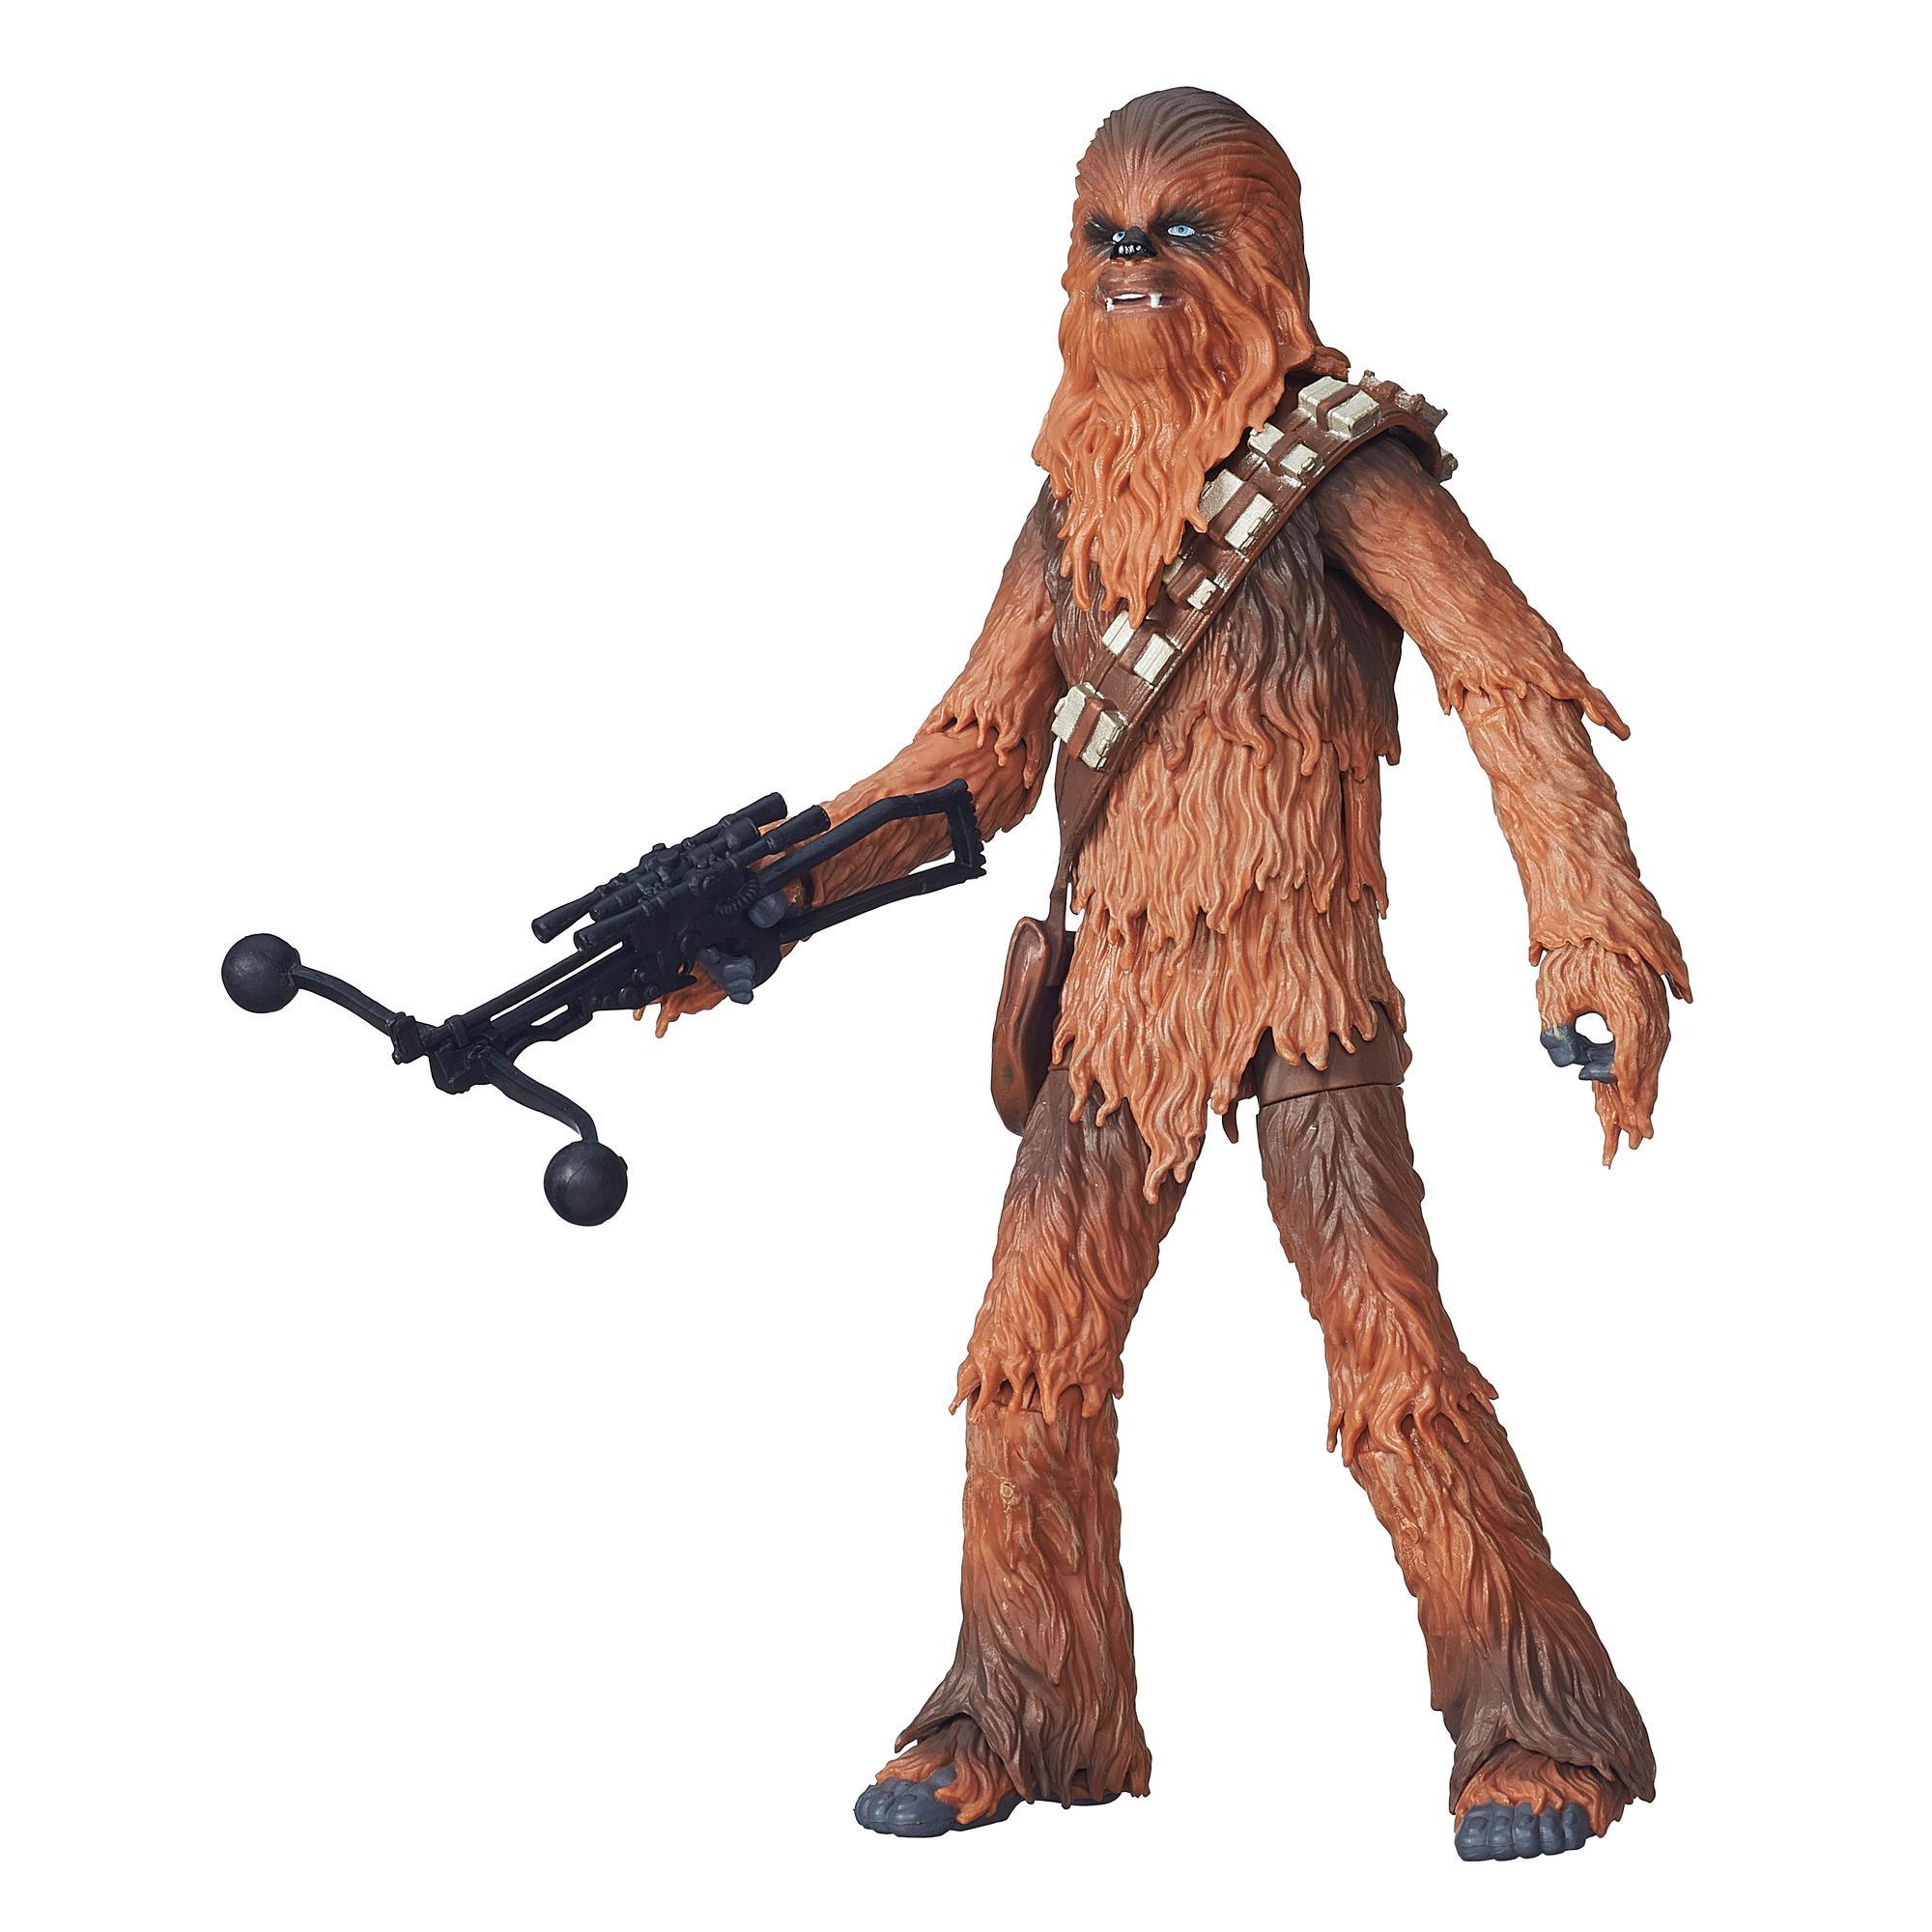 Star Wars The Black Series Chewbacca de 15 cm (6 in)